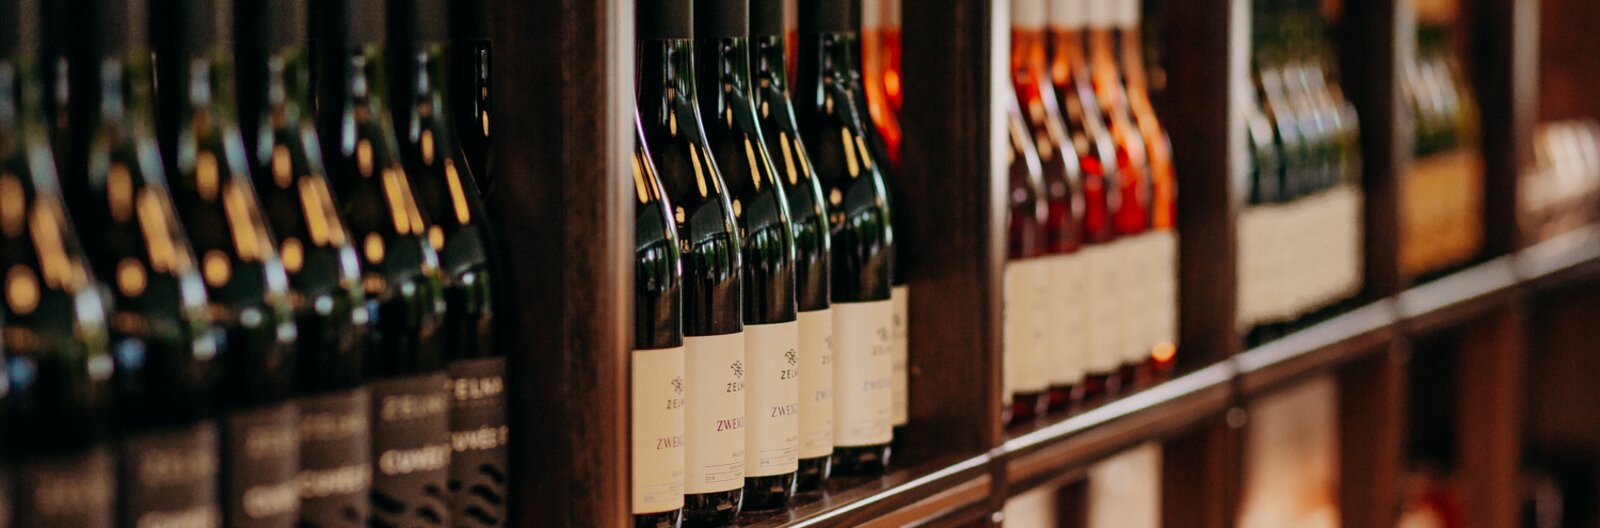 Maradj otthon, rendelj bort, borozz otthon!